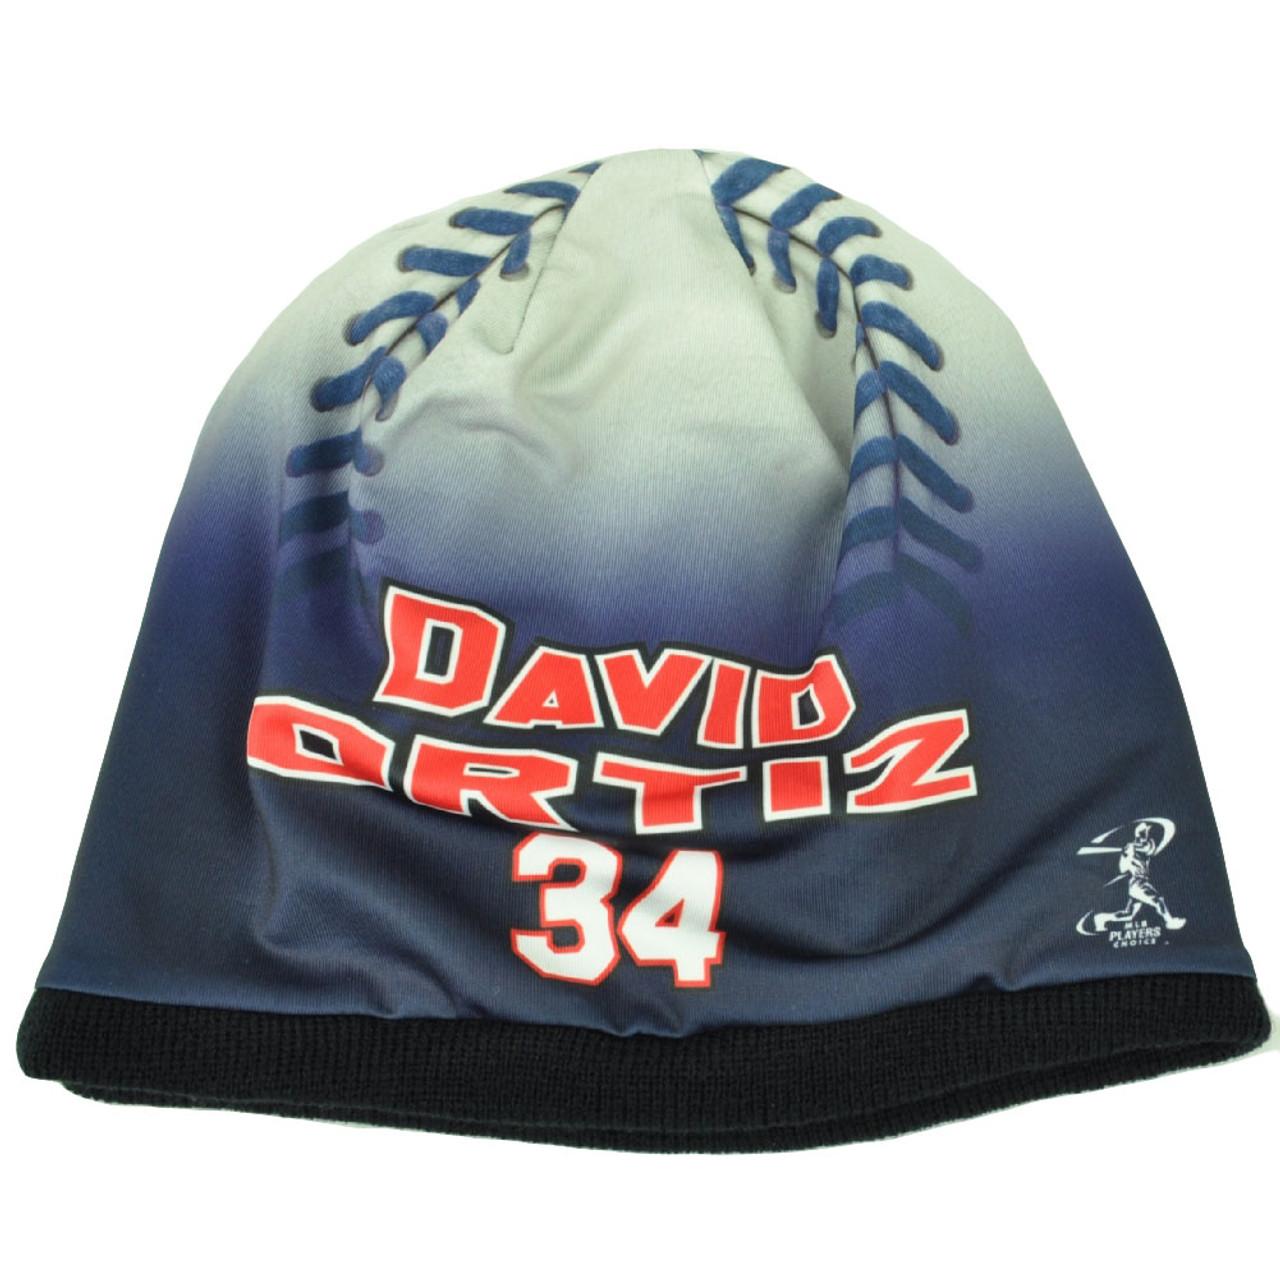 76550ee4fc9326 Boston Red Sox Mens Baseball Knit Beanie Cuffless Blue White David Ortiz 34  - Cap Store Online.com